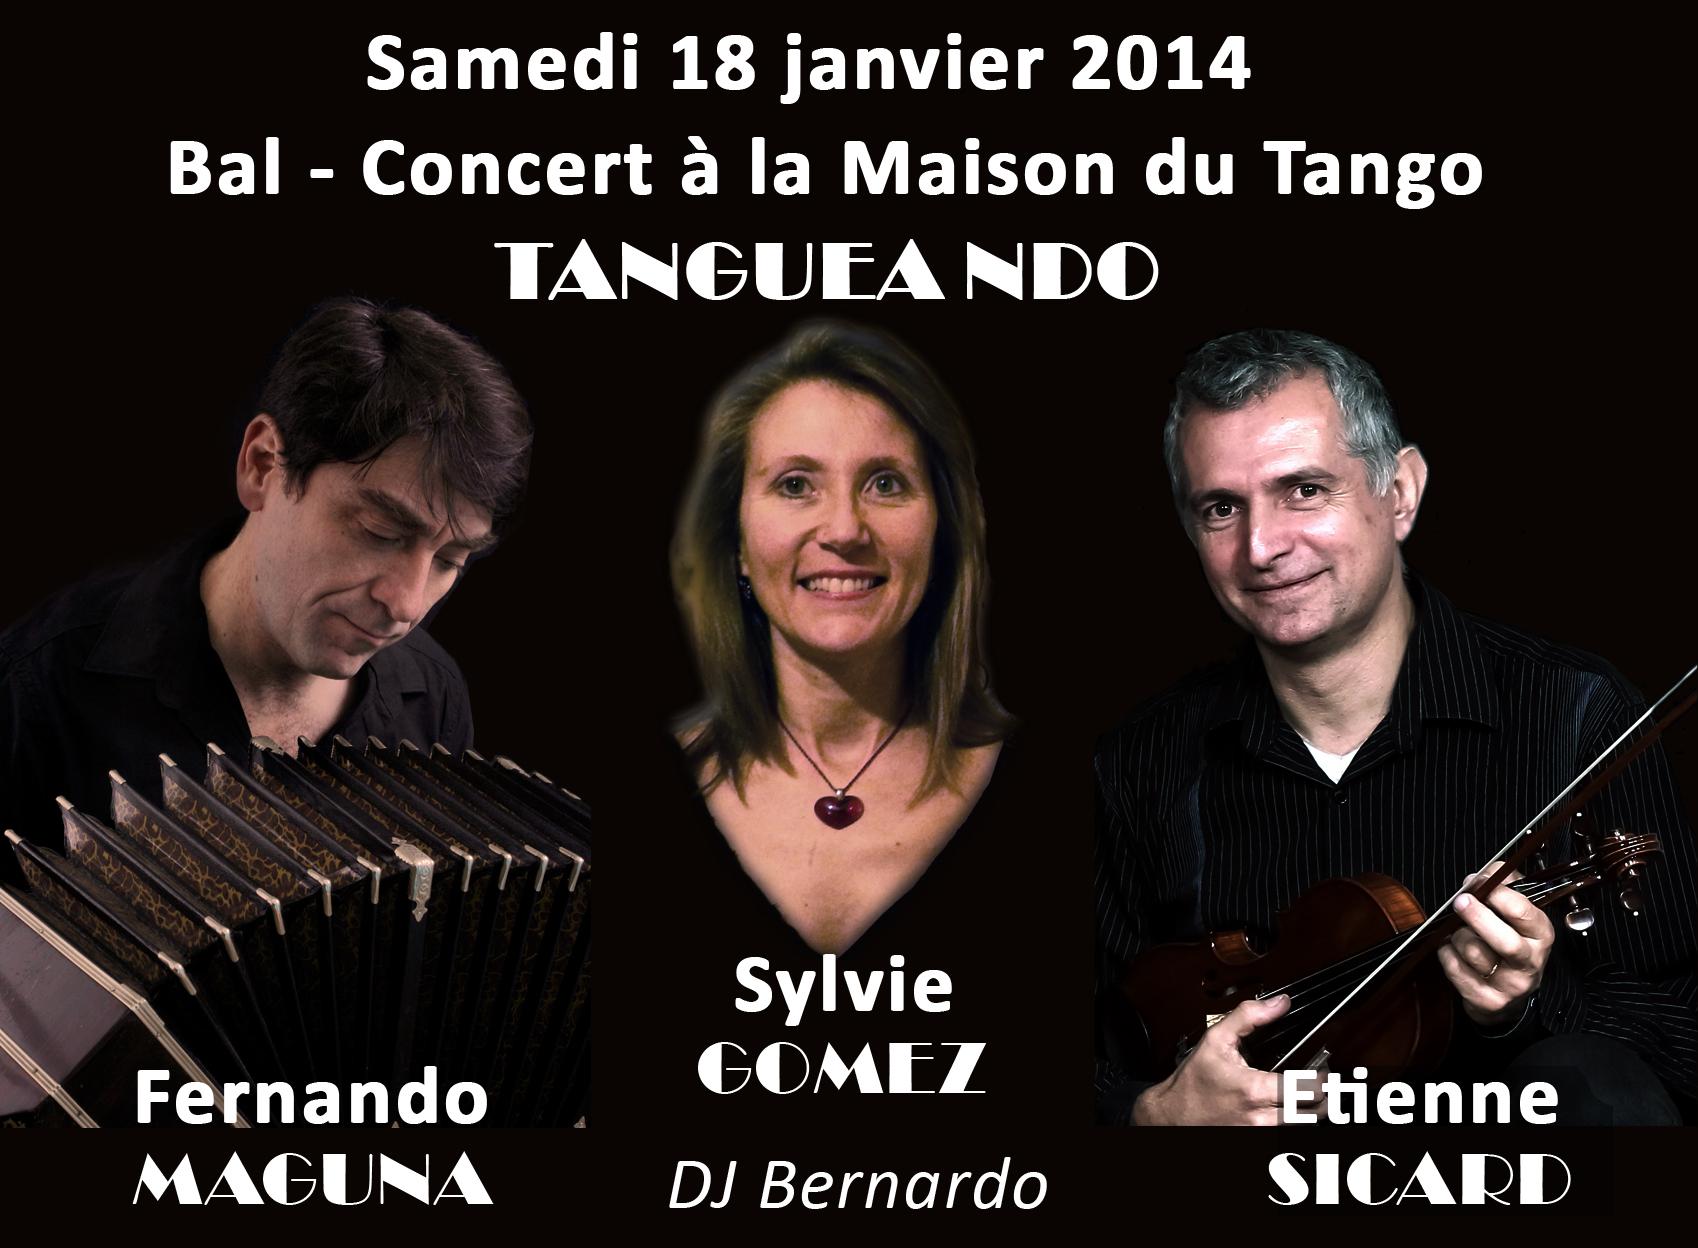 Trio Maguna Gomez Sicard